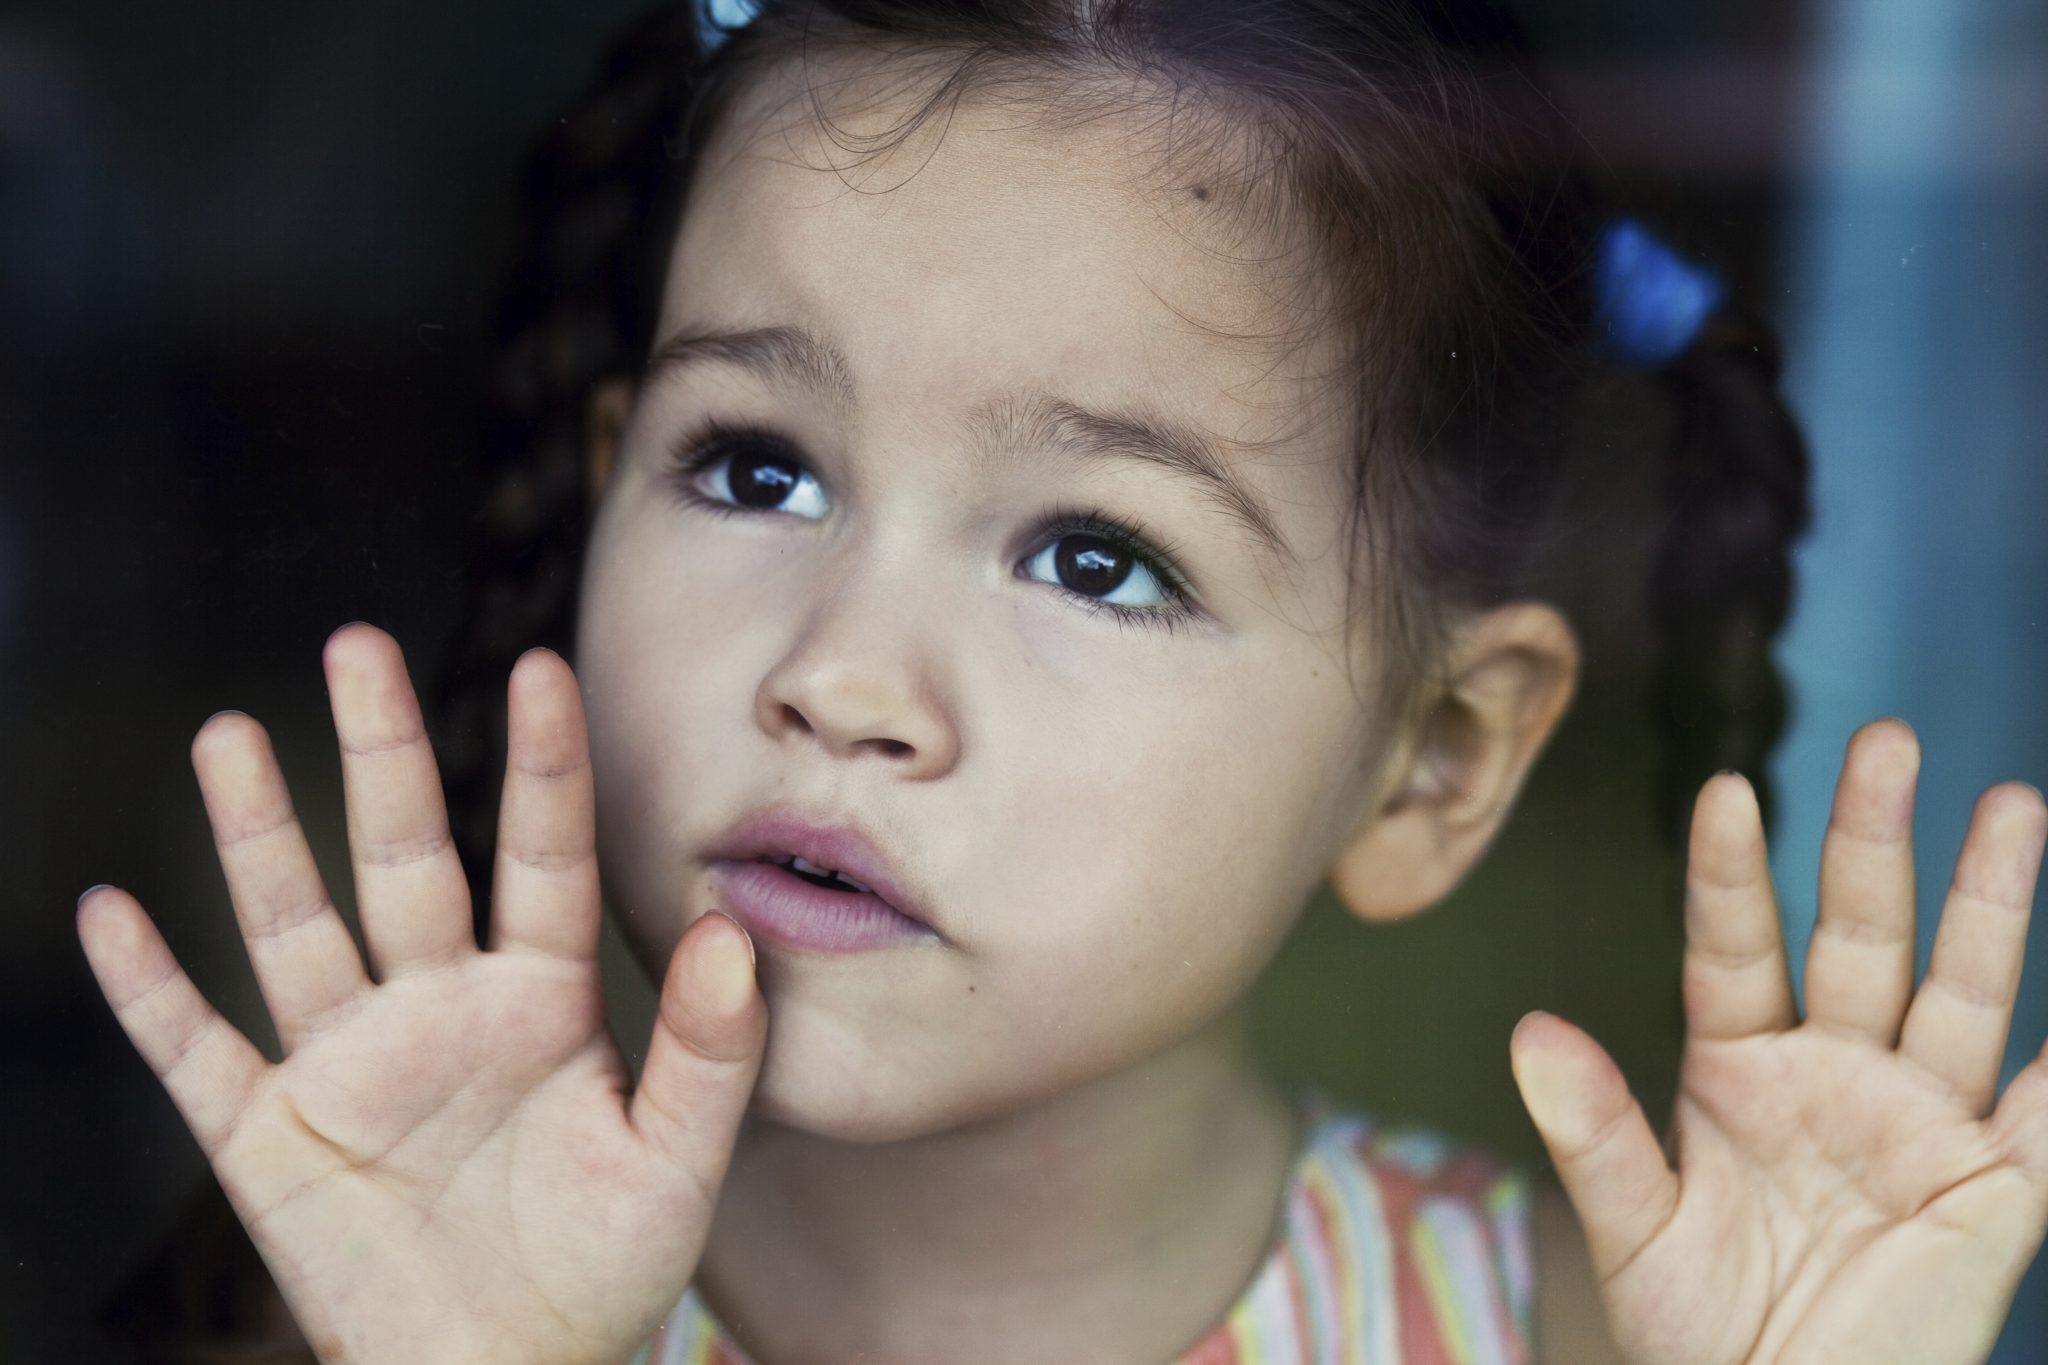 Child Abuse • RESPECTT • Affordable Mandatory Classes • Court Ordered Classes • Mandatory Training • affordablemandatoryclasses.com